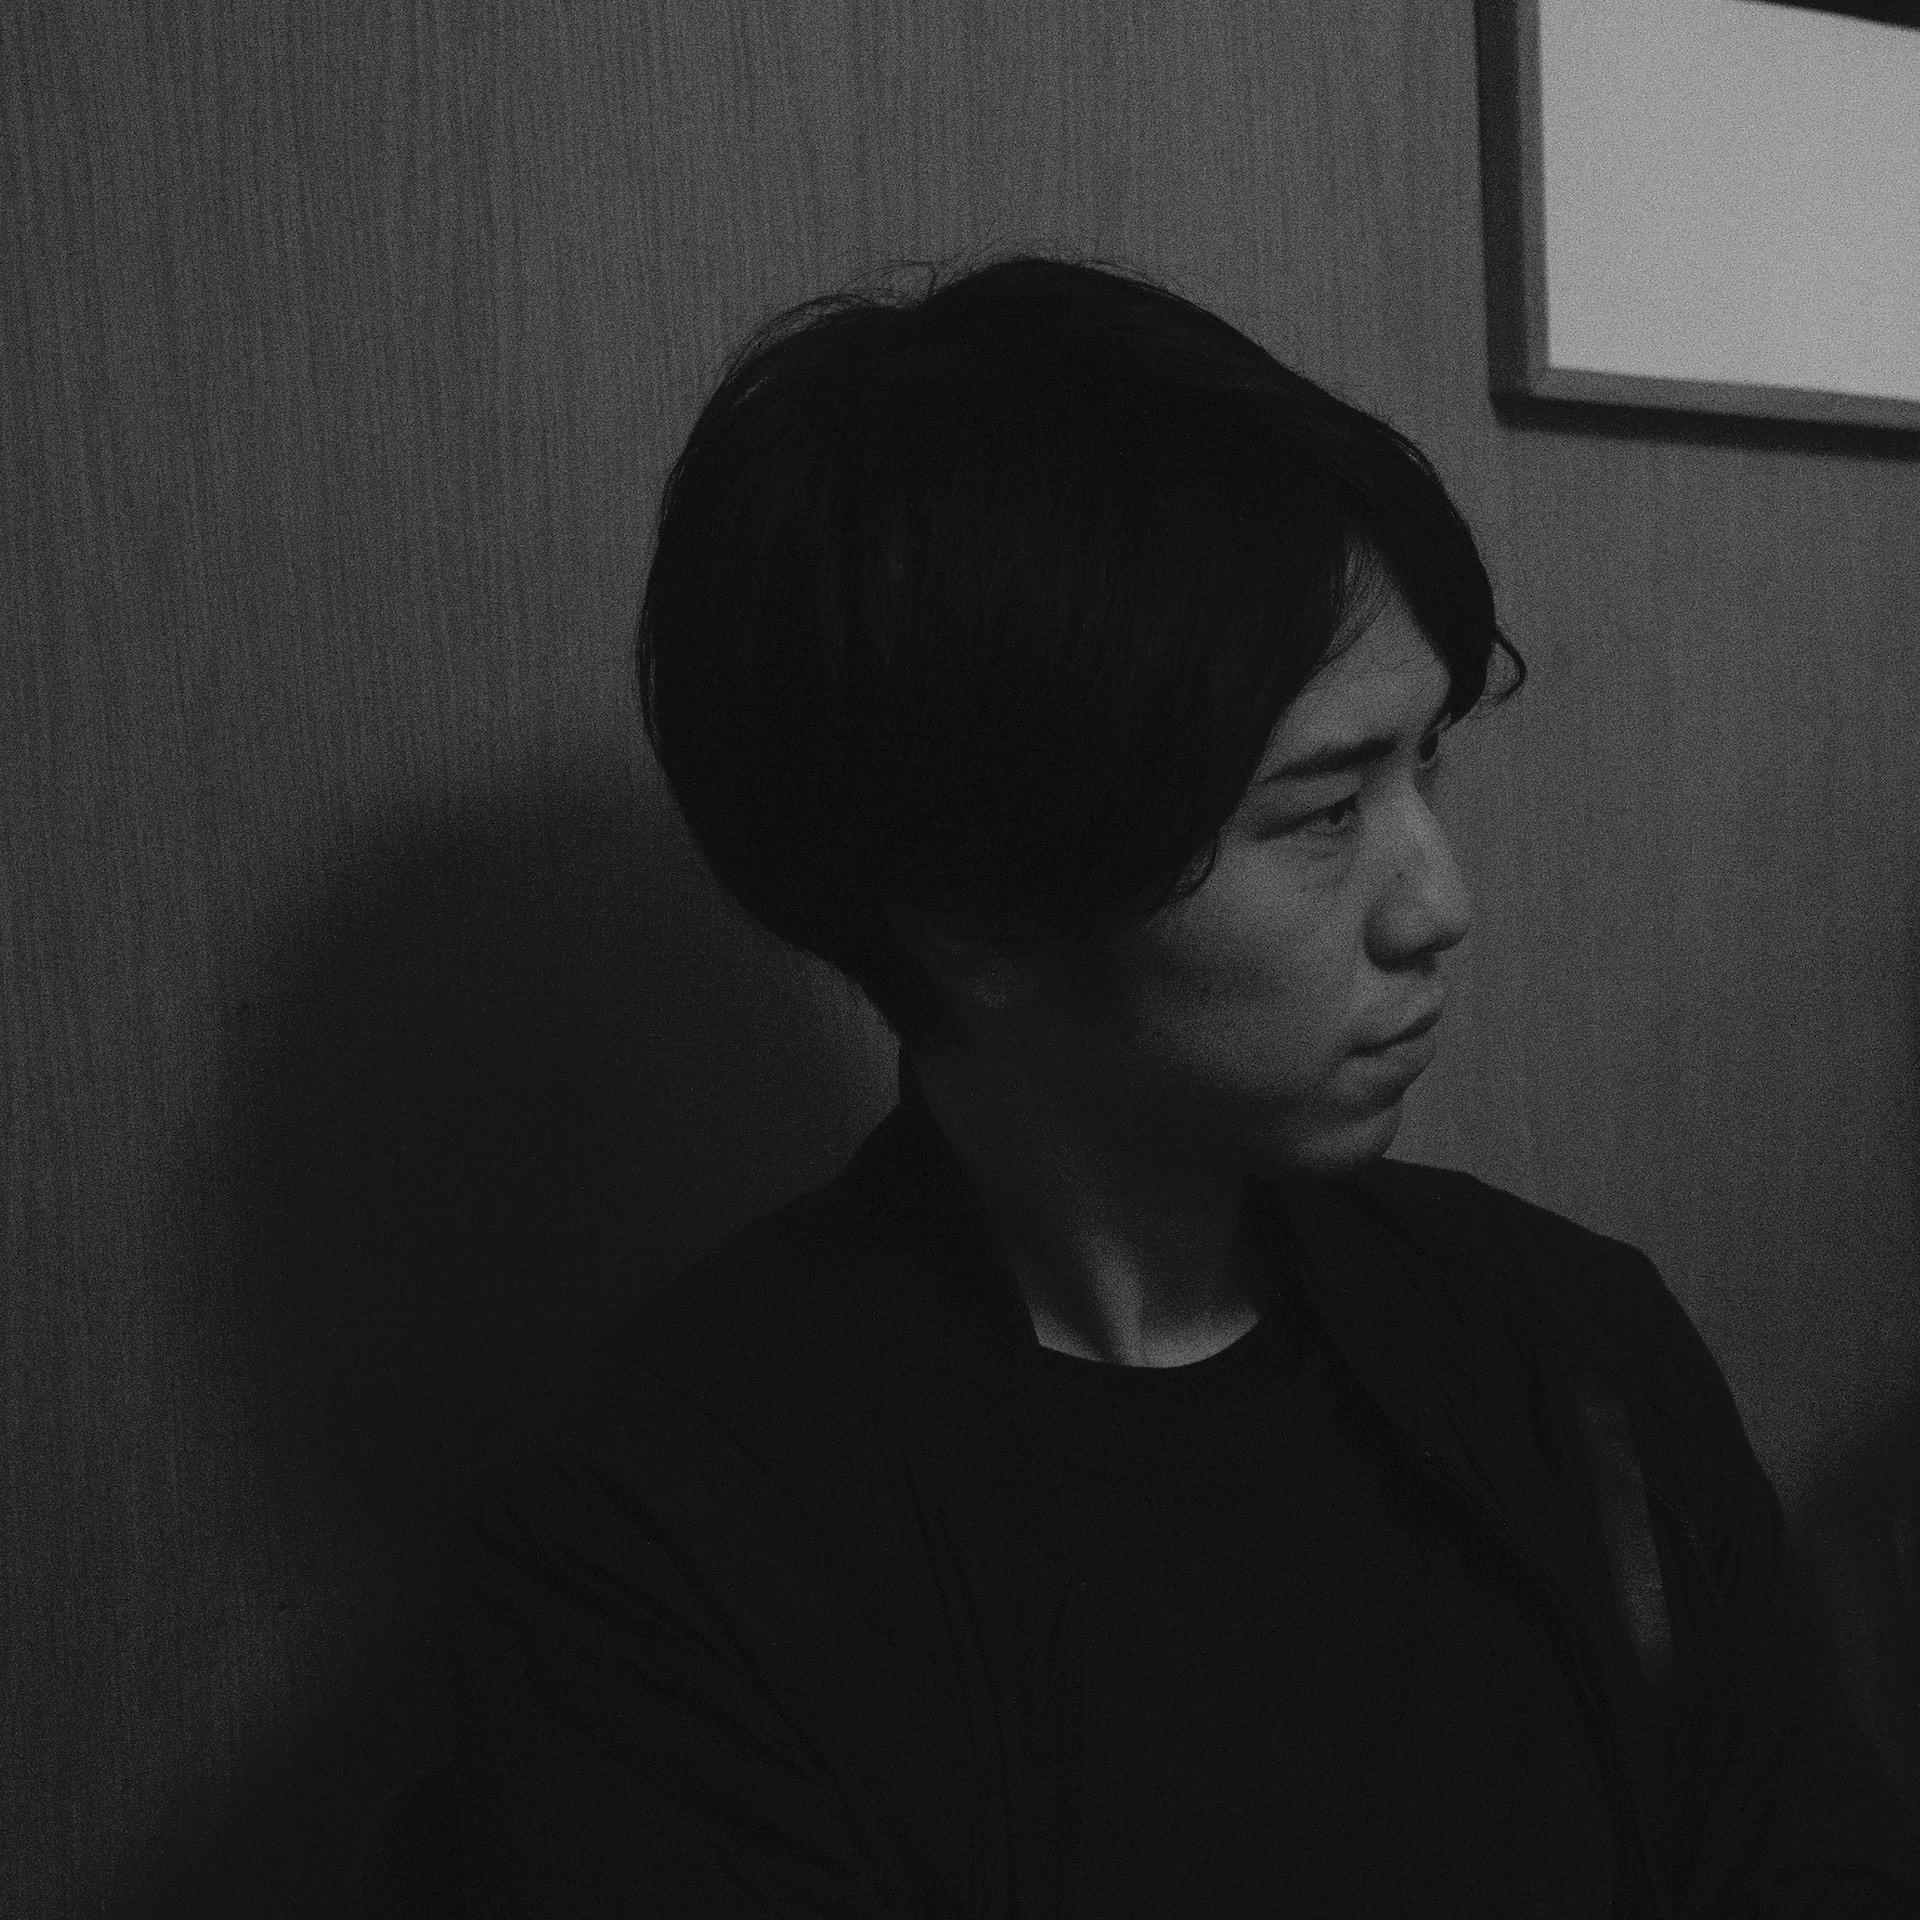 <Japan Media Arts Distributed Museum ETERNAL ~千秒の清寂>が羽田空港国際線ターミナルで開催!KyokaやTETSUJI OHNOらも作品に参加 ac200127_eternal_01